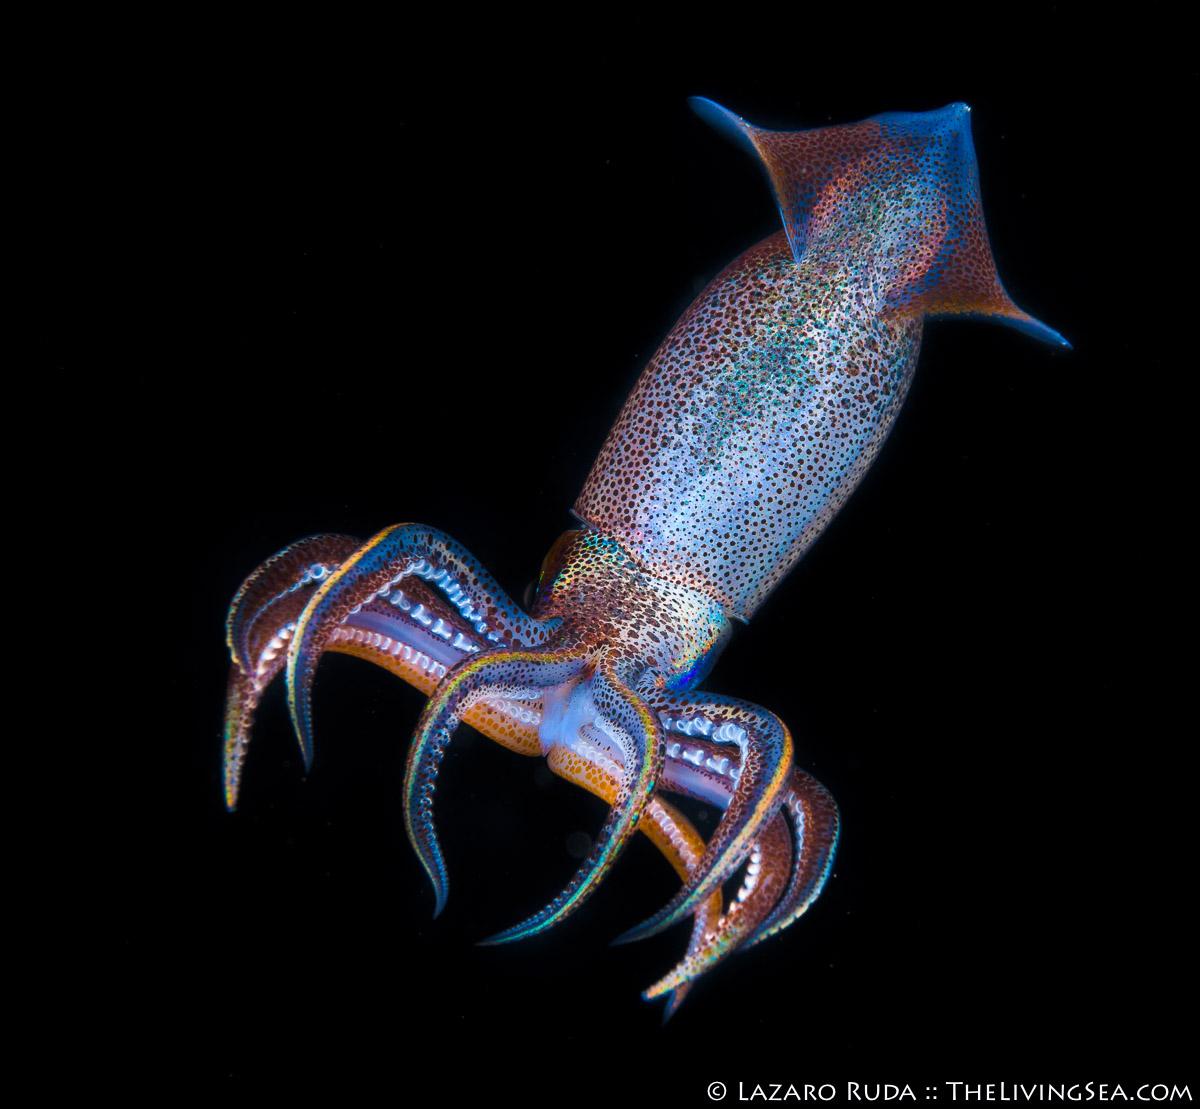 Antarctic squid, Cephalopods: Cephalopoda, Colossal squid, Cranchiidae, Invertebrates, LIFE STAGES, less than 1 inch, Laz Ruda, Lazaro Ruda Wildlife Photographer, MARINE LIFE, Mesonychoteuthis, Mesonychoteuthis hamiltoni, Mollusks: Mollusca, Oegopsida, PHOTO TYPE, night dive, SIZE, macro, Taoniinae, TheLivingSea.com, West Palm Beach, [LOCATION], blackwater, larvae, giant cranch squid, macro, marine, ocean, underwater, underwater photo